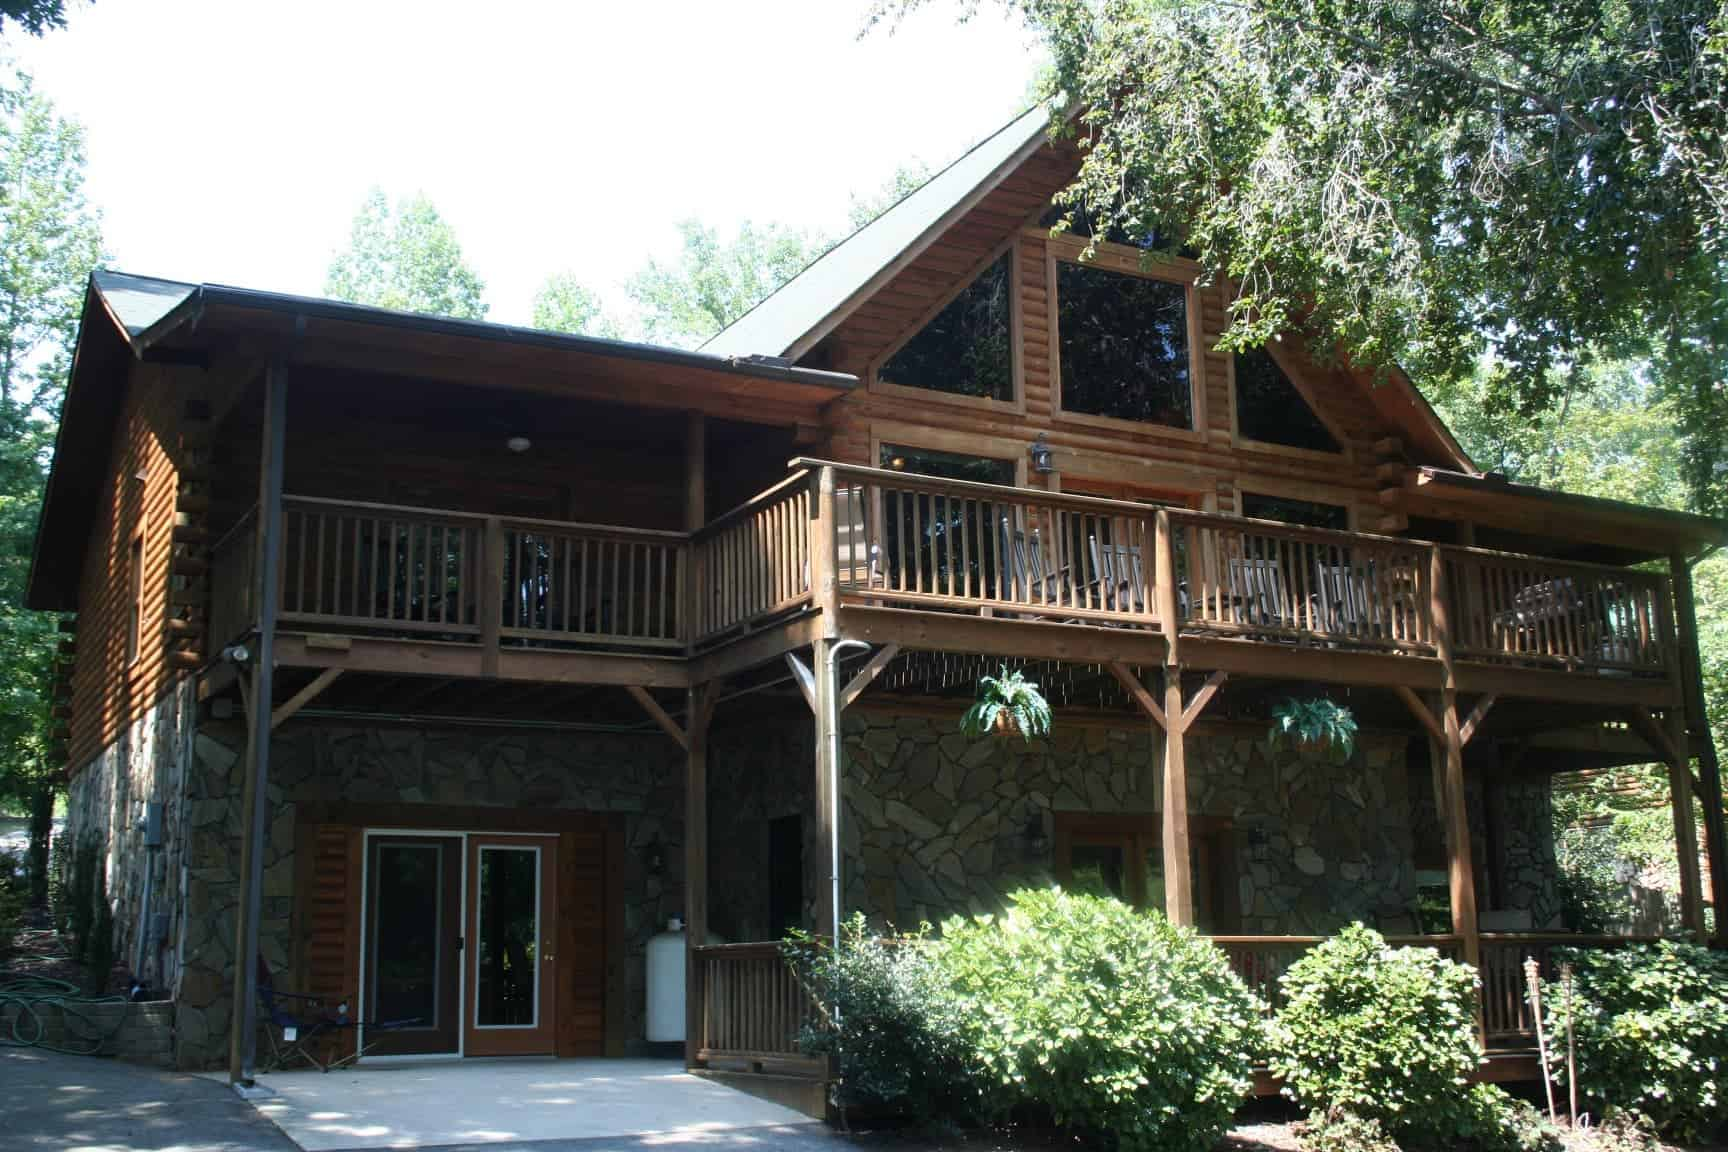 Image of luxury cabin in Sherrills Ford, North Carolina